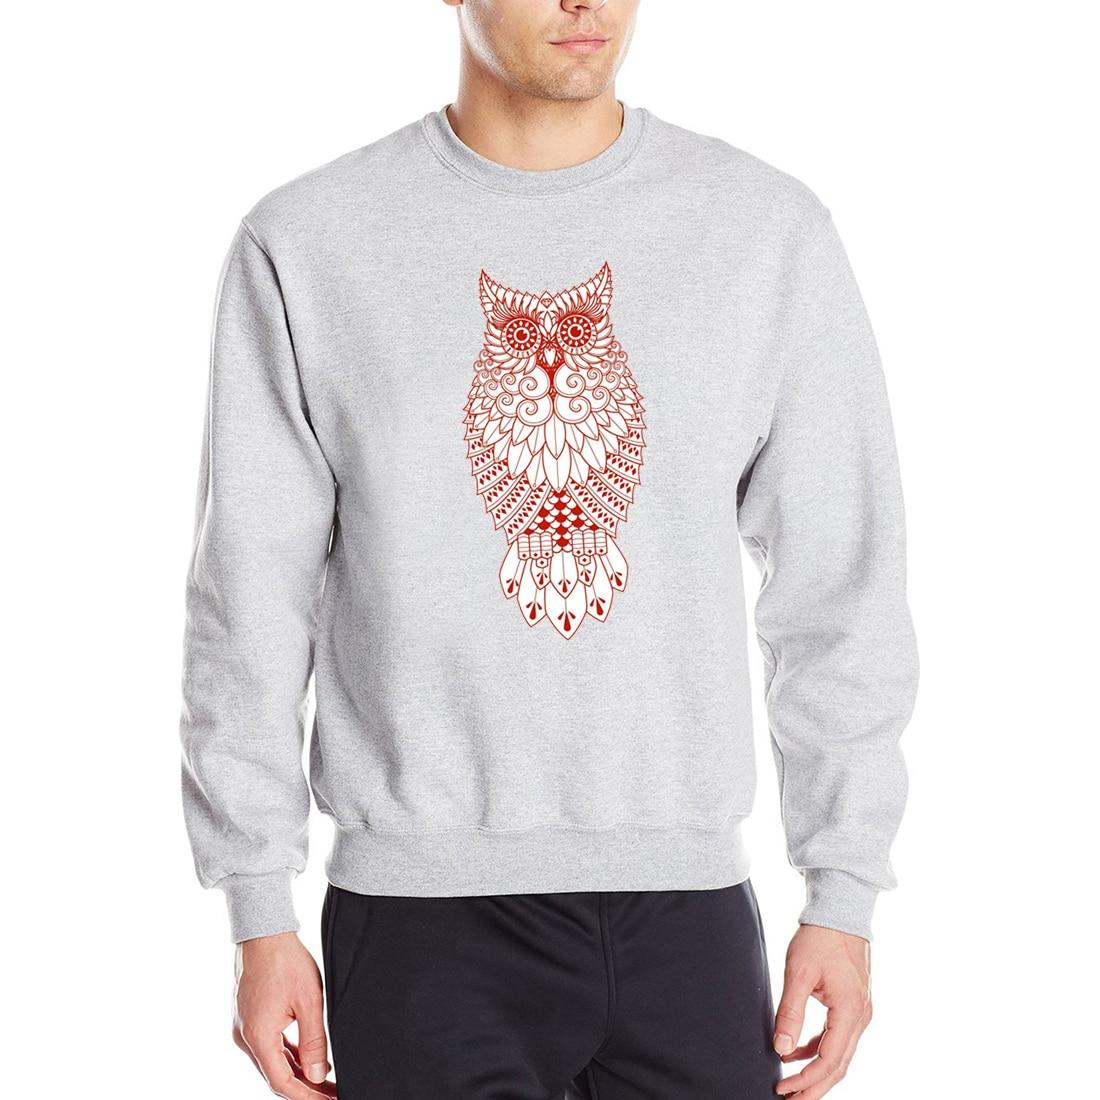 2019 Spring Autumn Animal Owl Sweatshirts Hoodies Men Casual Long Sleeve Hip Hop Pollovers Fleece Mens Brand Sweatshirt CM01